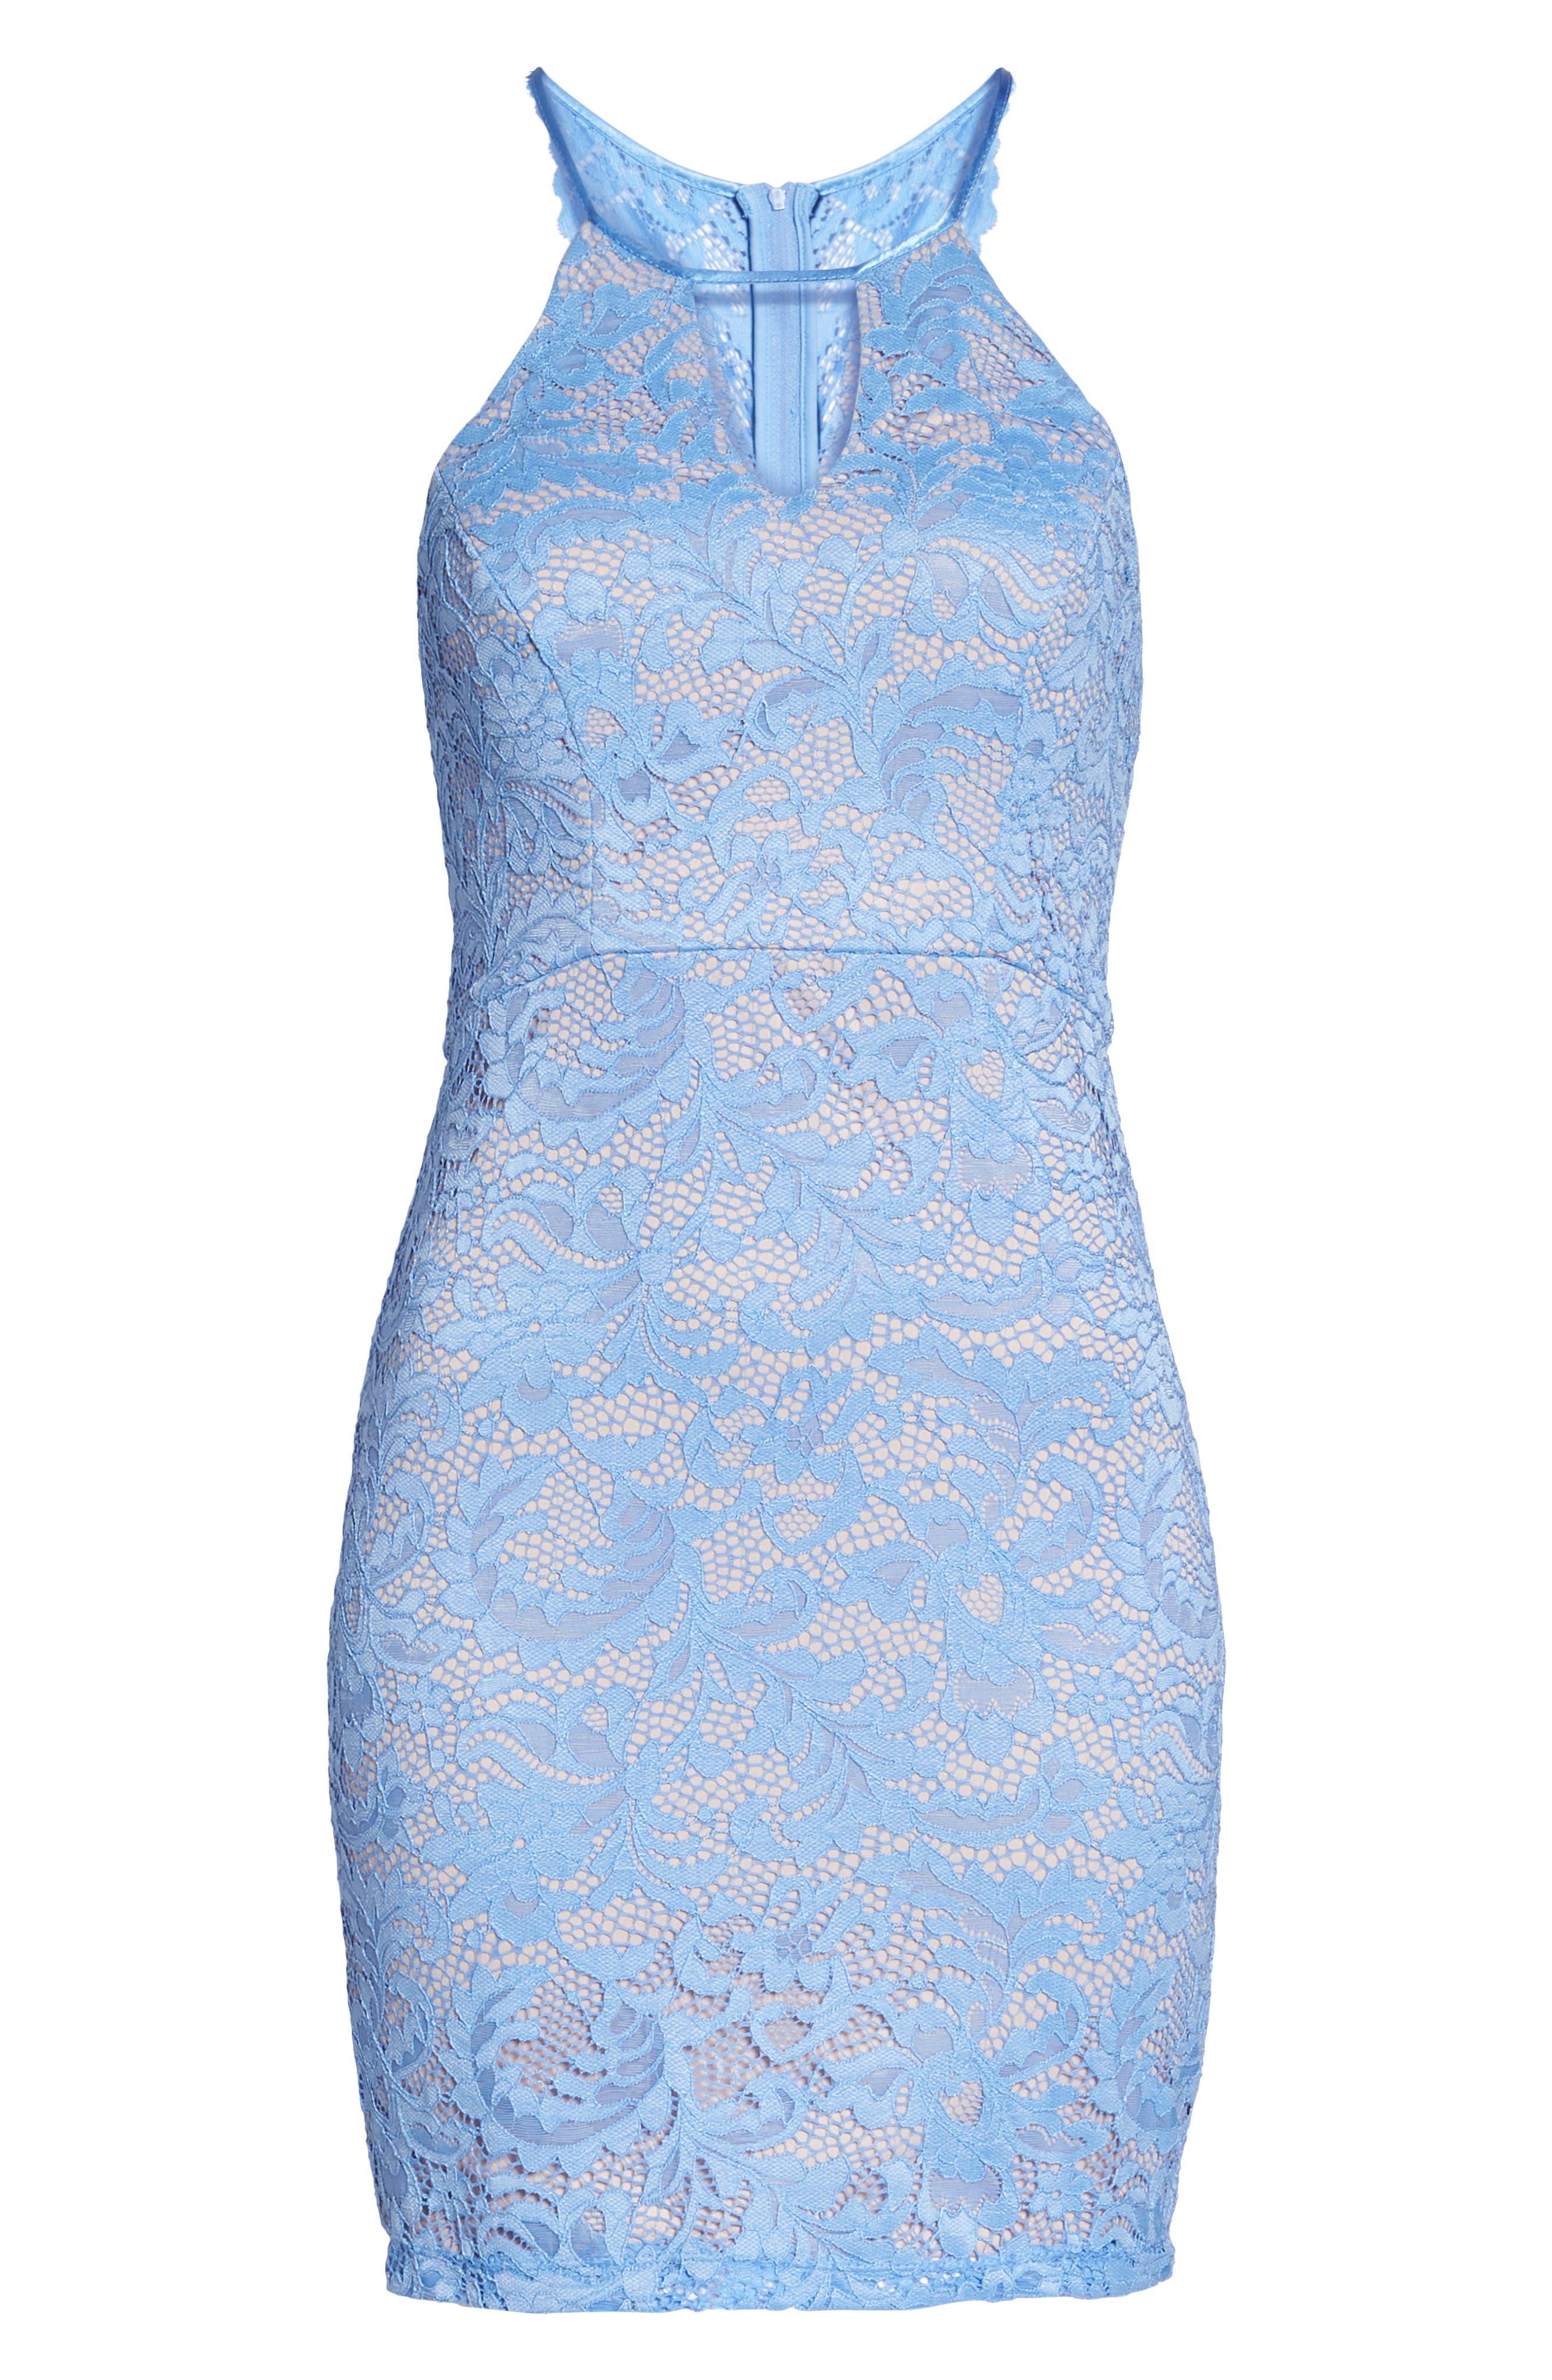 Racerback Lace Halter Dress,                             Alternate thumbnail 6, color,                             554